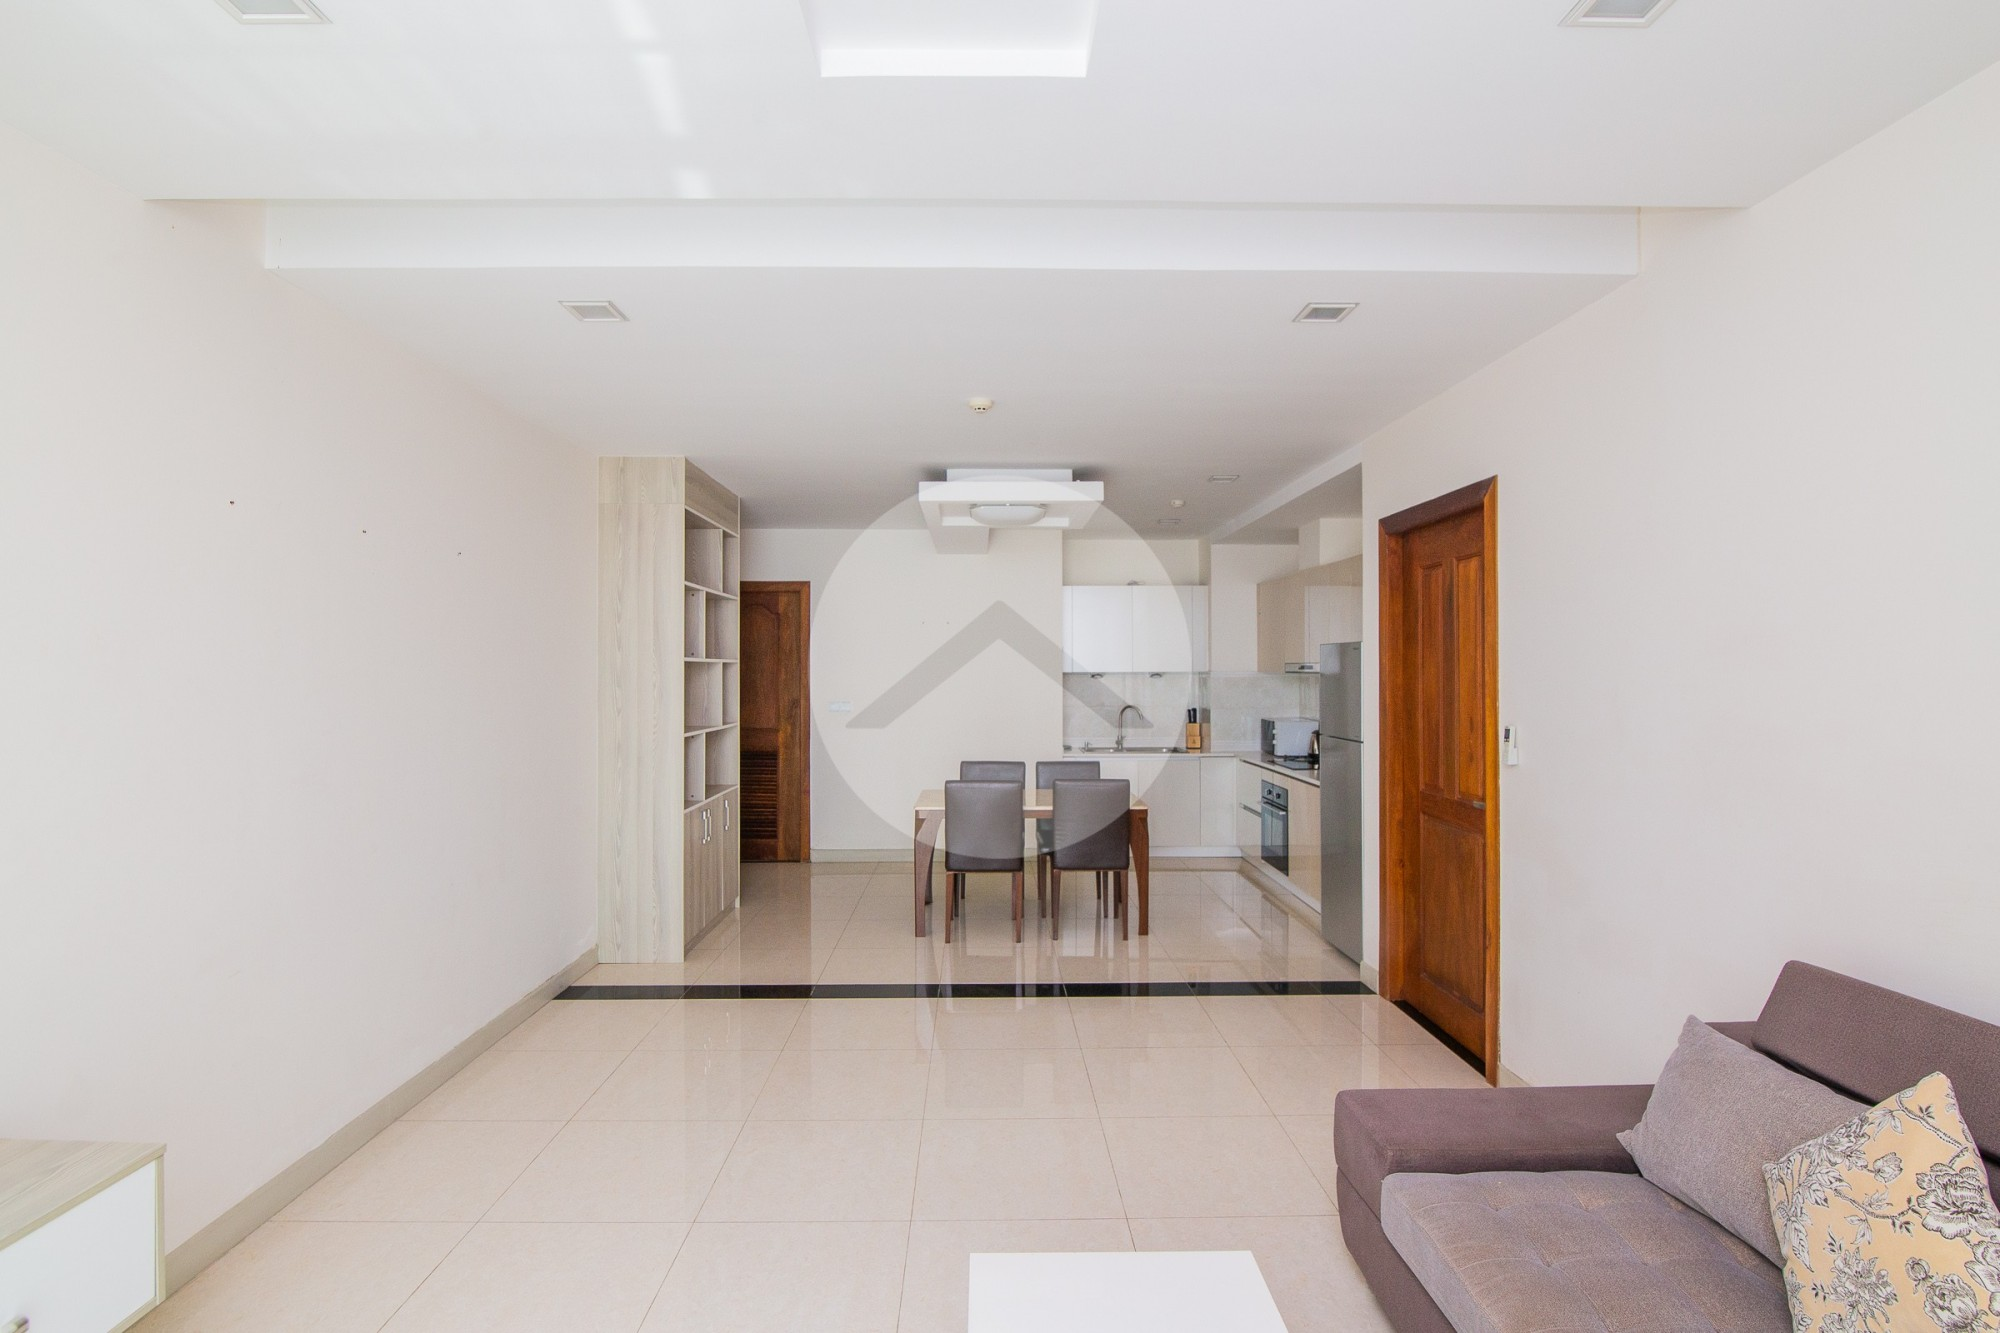 1 Bedroom Serviced Apartment For Rent - BKK3, Phnom Penh